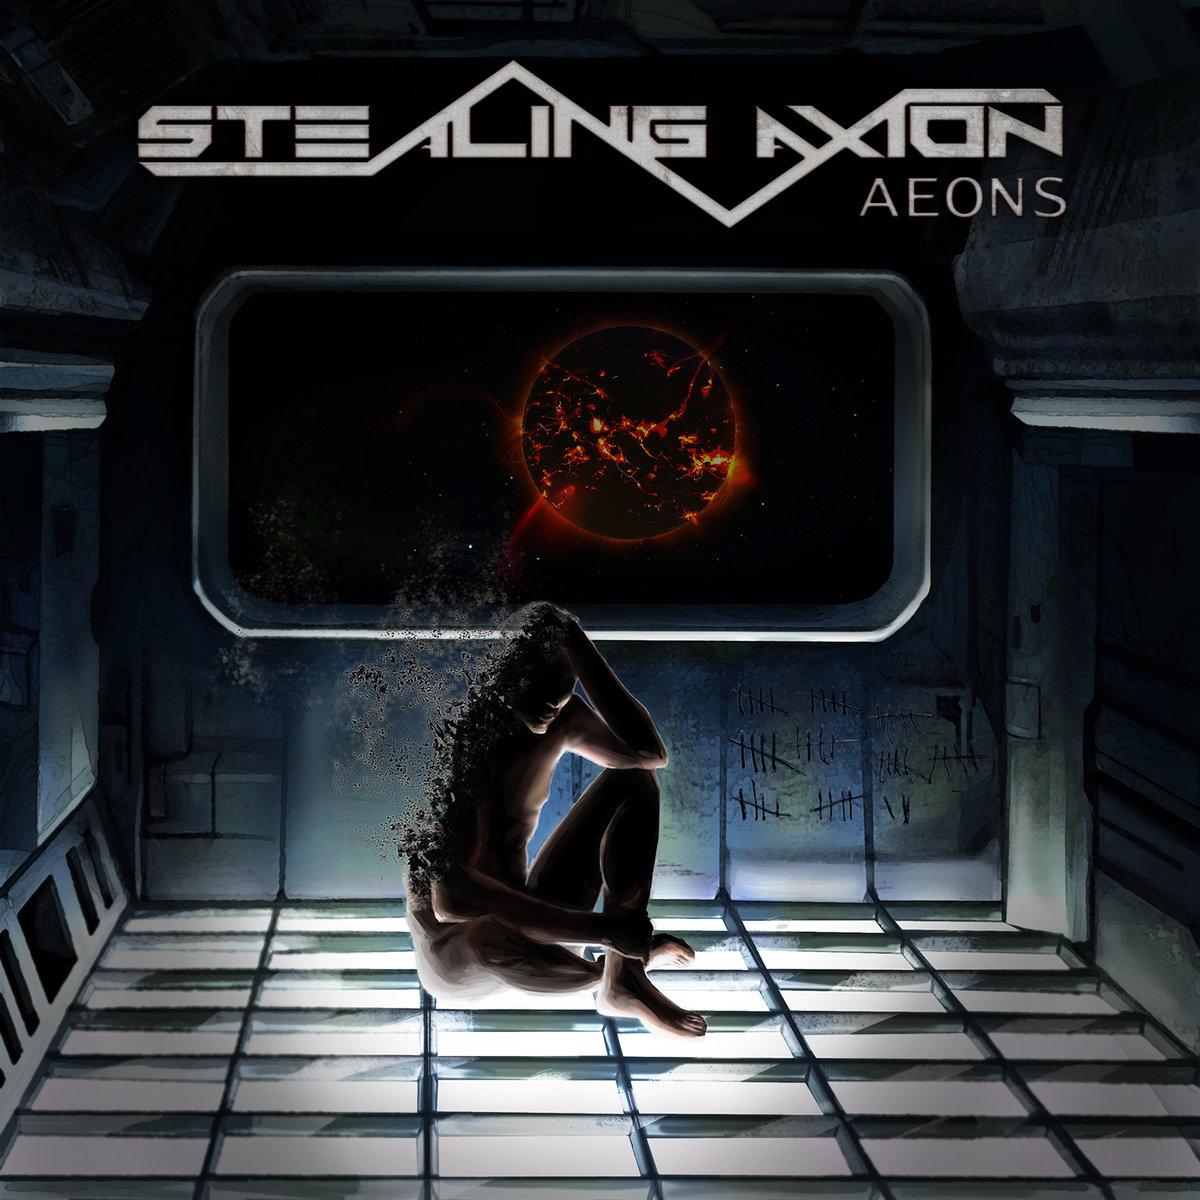 STEALING AXION - AEONS